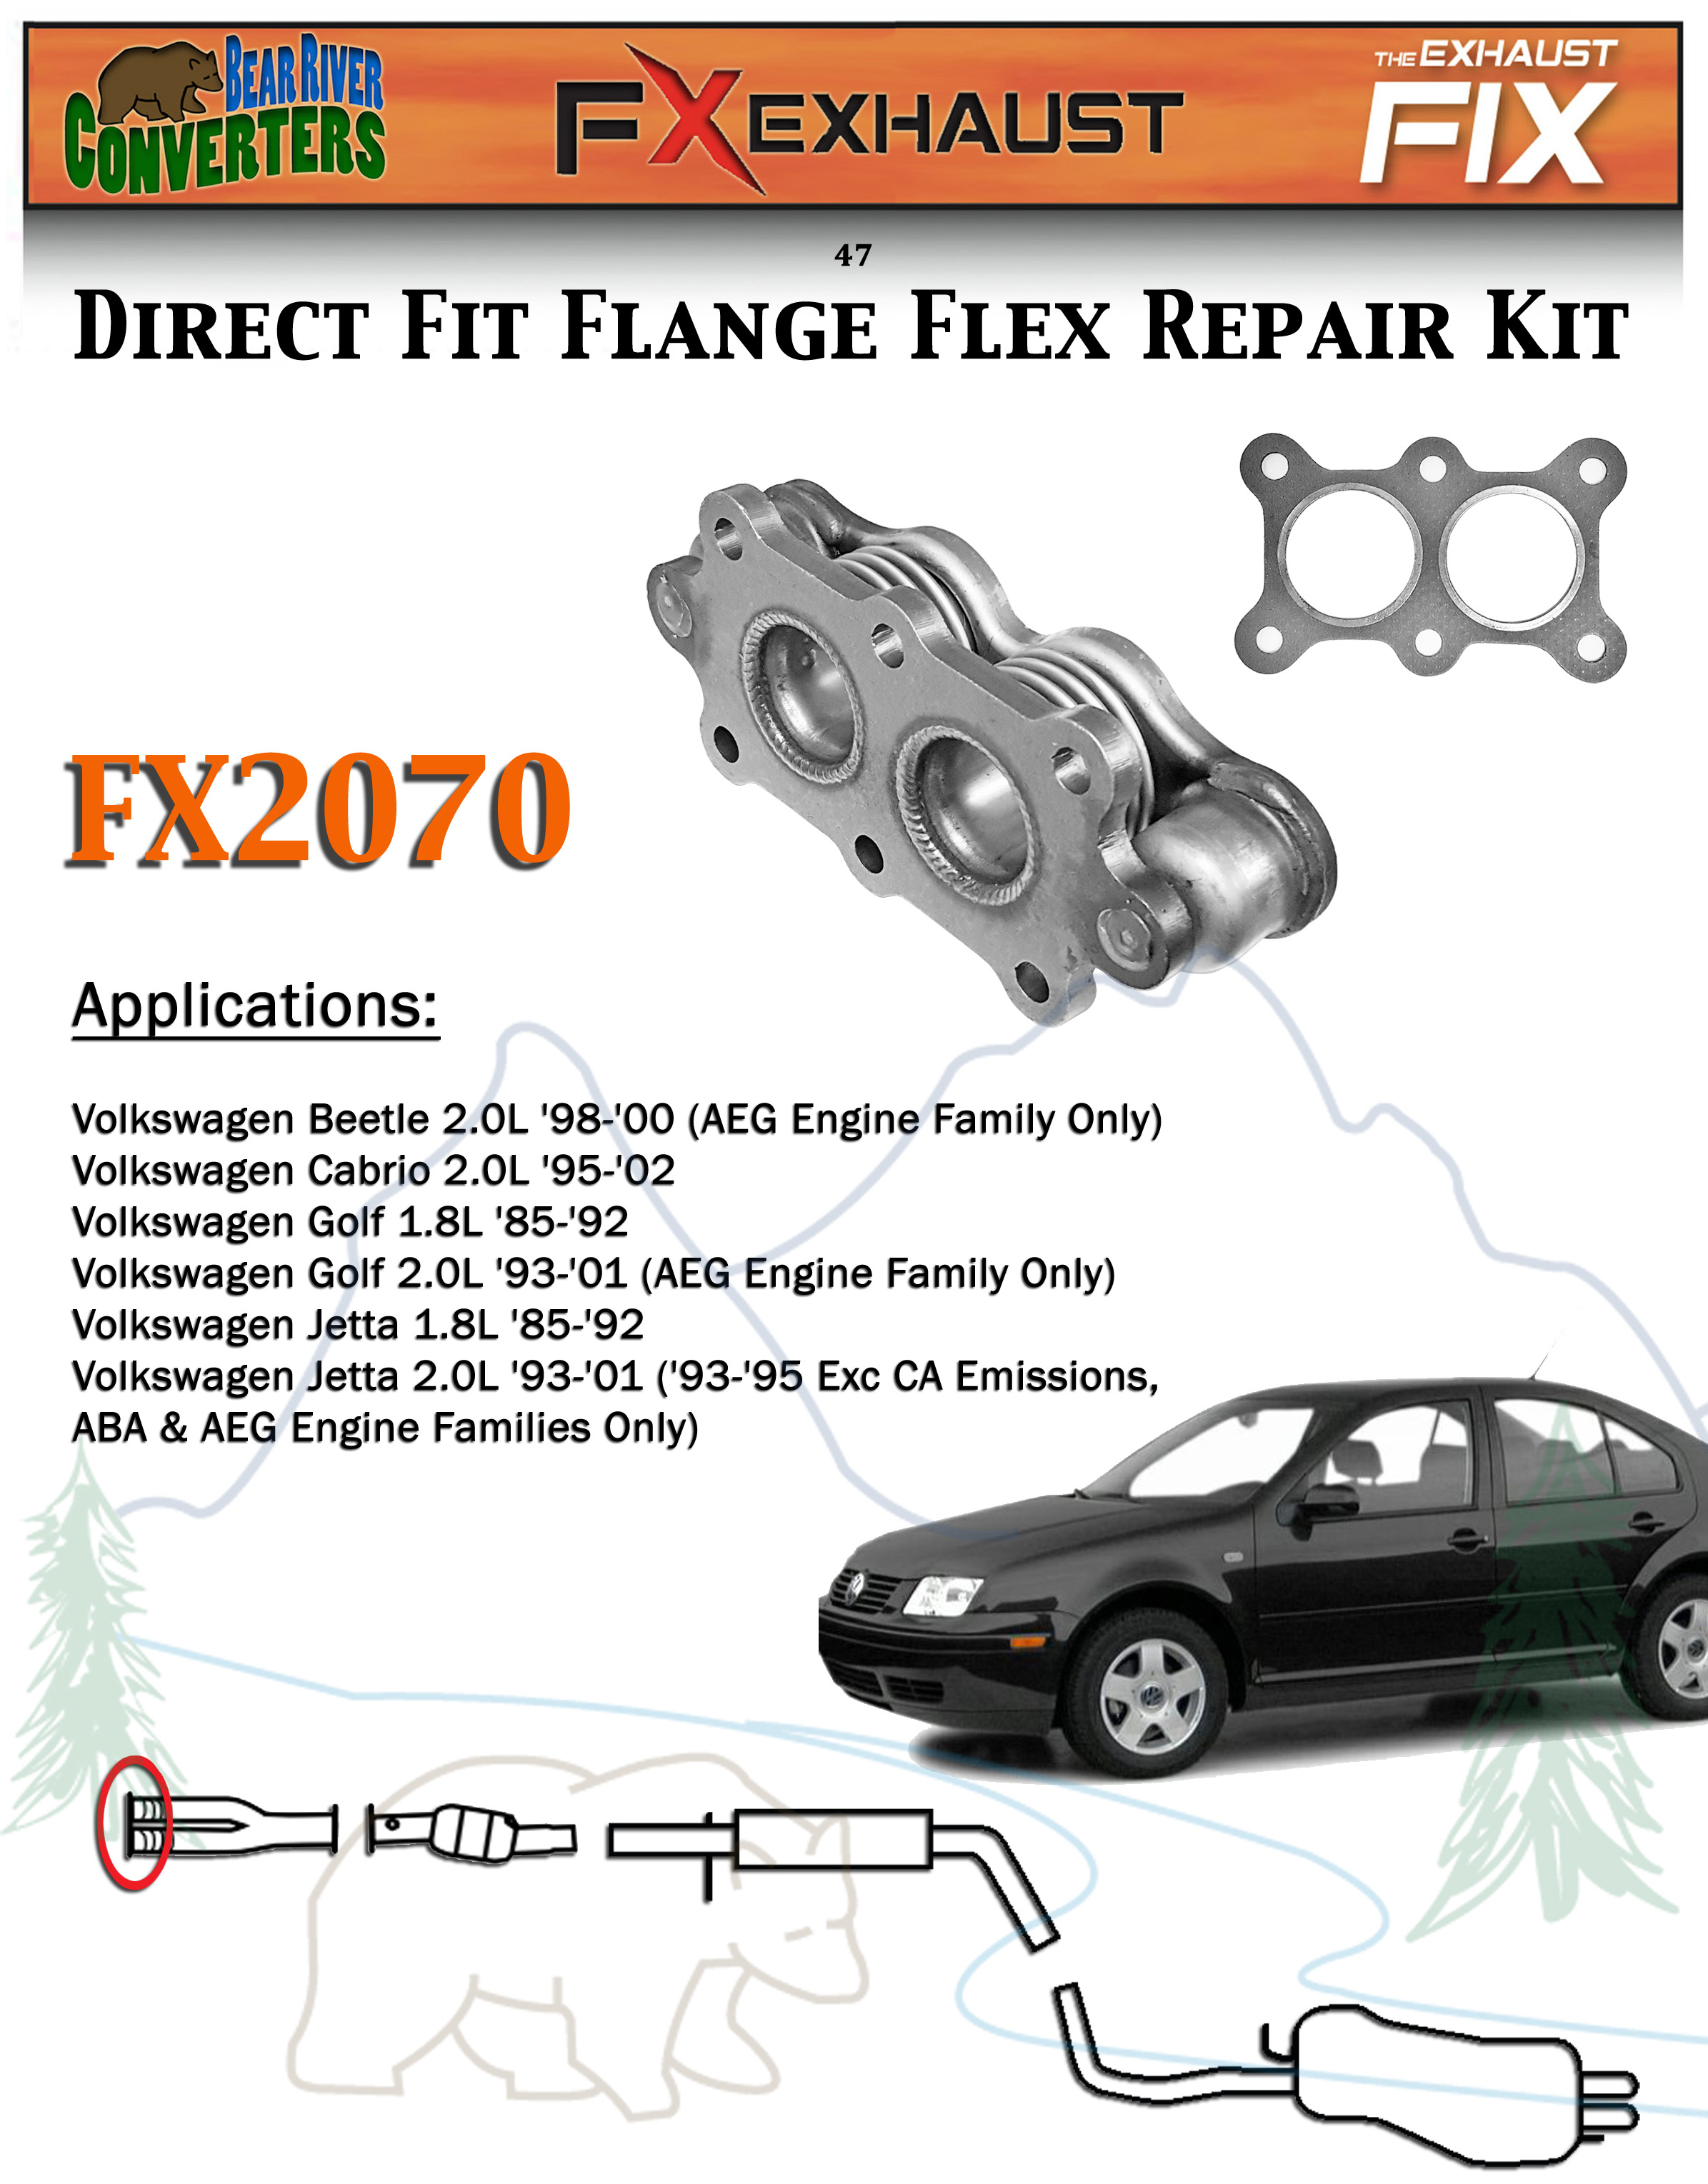 Volkswagen Cabrio Exhaust Parts 2002 Jetta 1 8l Engine Diagram Fx Direct Fit Flange Flex Repair Pipe Replacement Kit 2391x3058